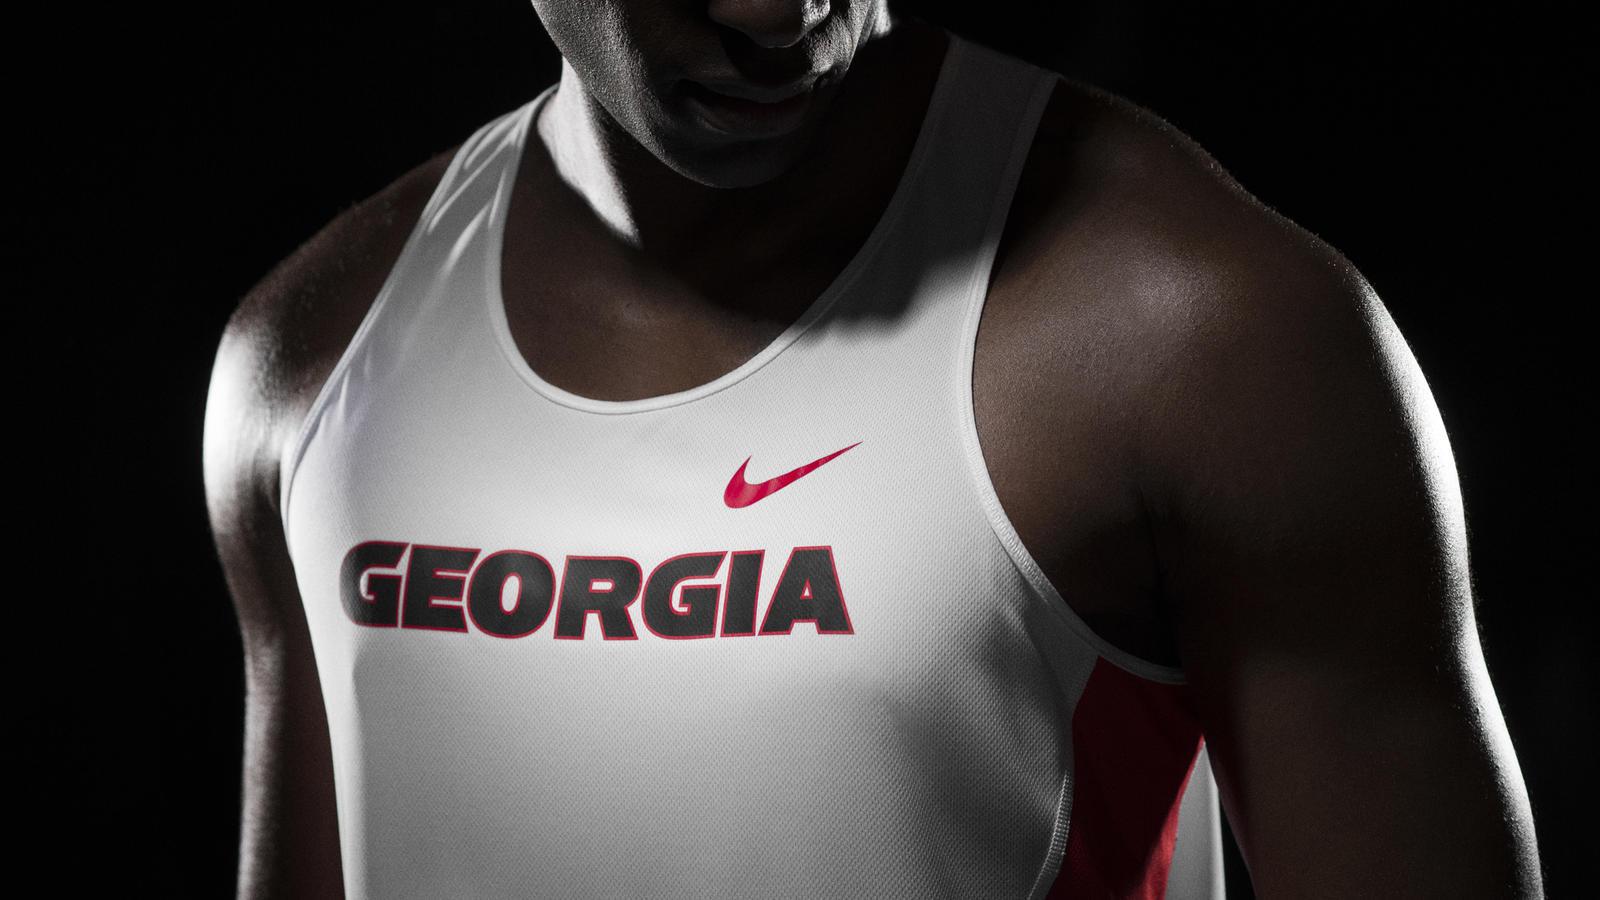 Georgia Track & Field